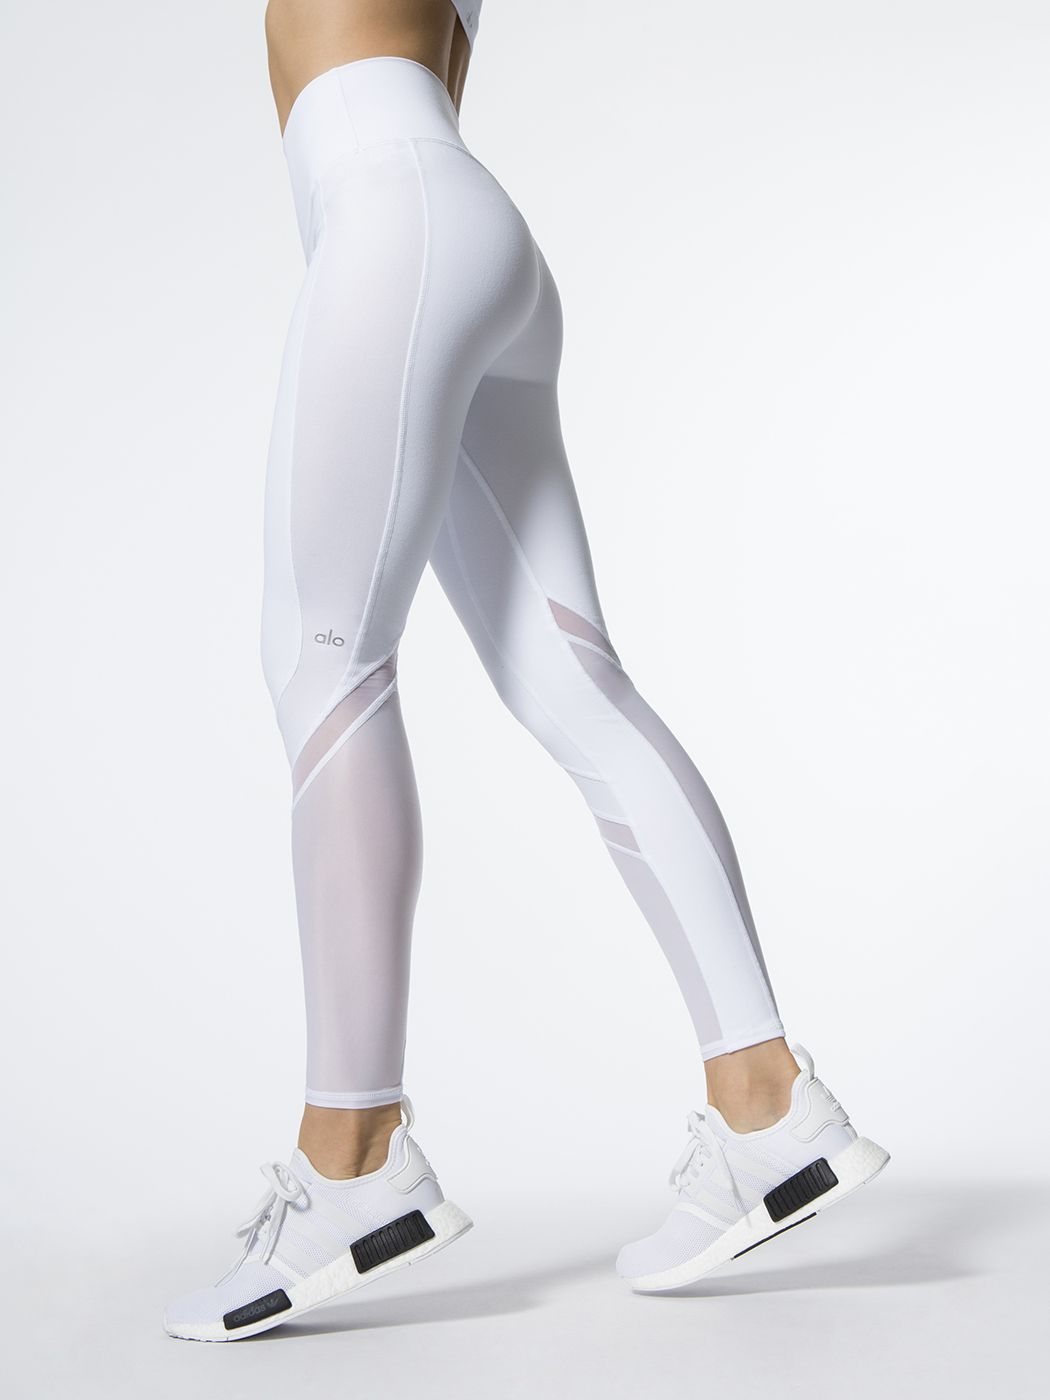 nike legging white